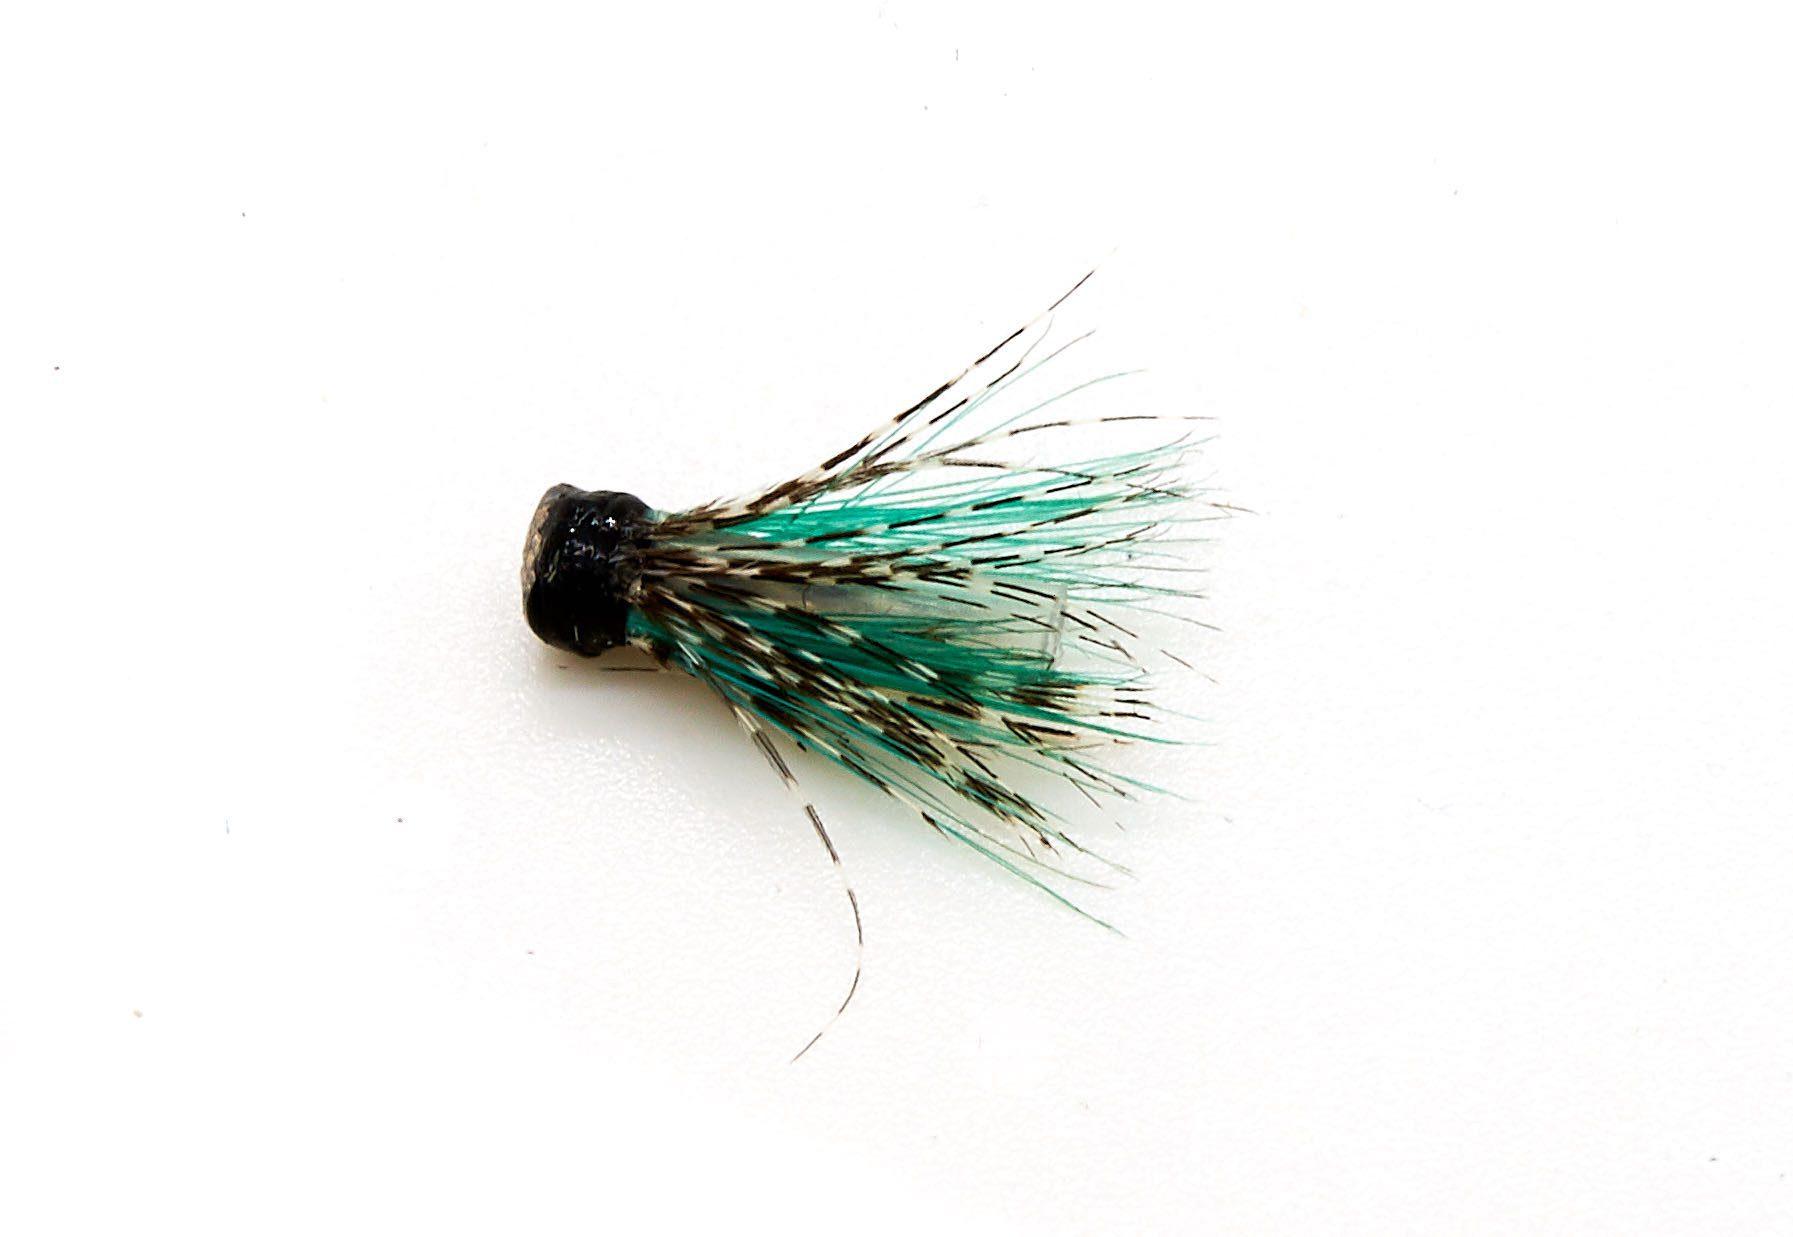 Blue Charm - Micro sub-fly # 14 - 16